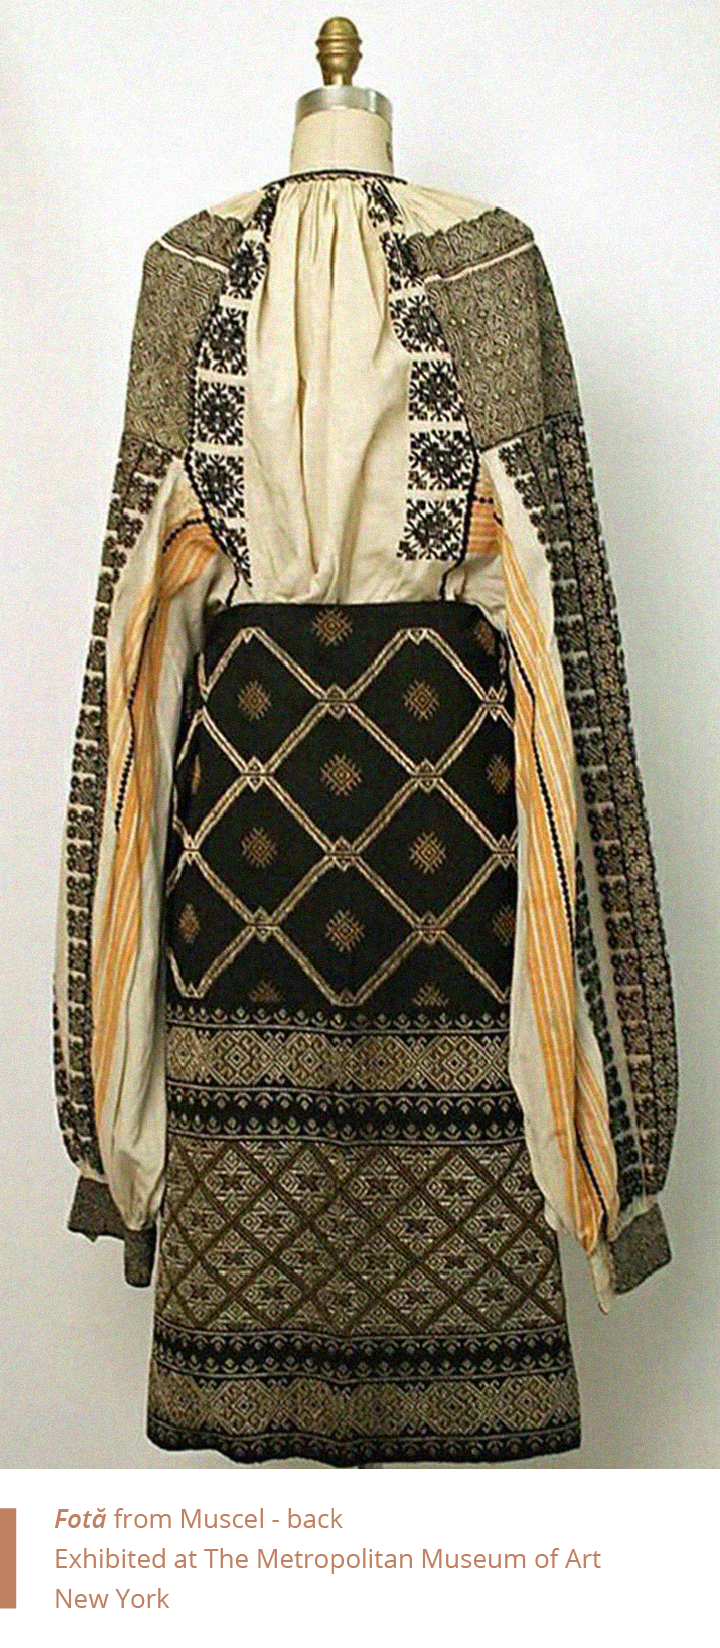 Folkwear-Society-Typology-fota-muscel-back